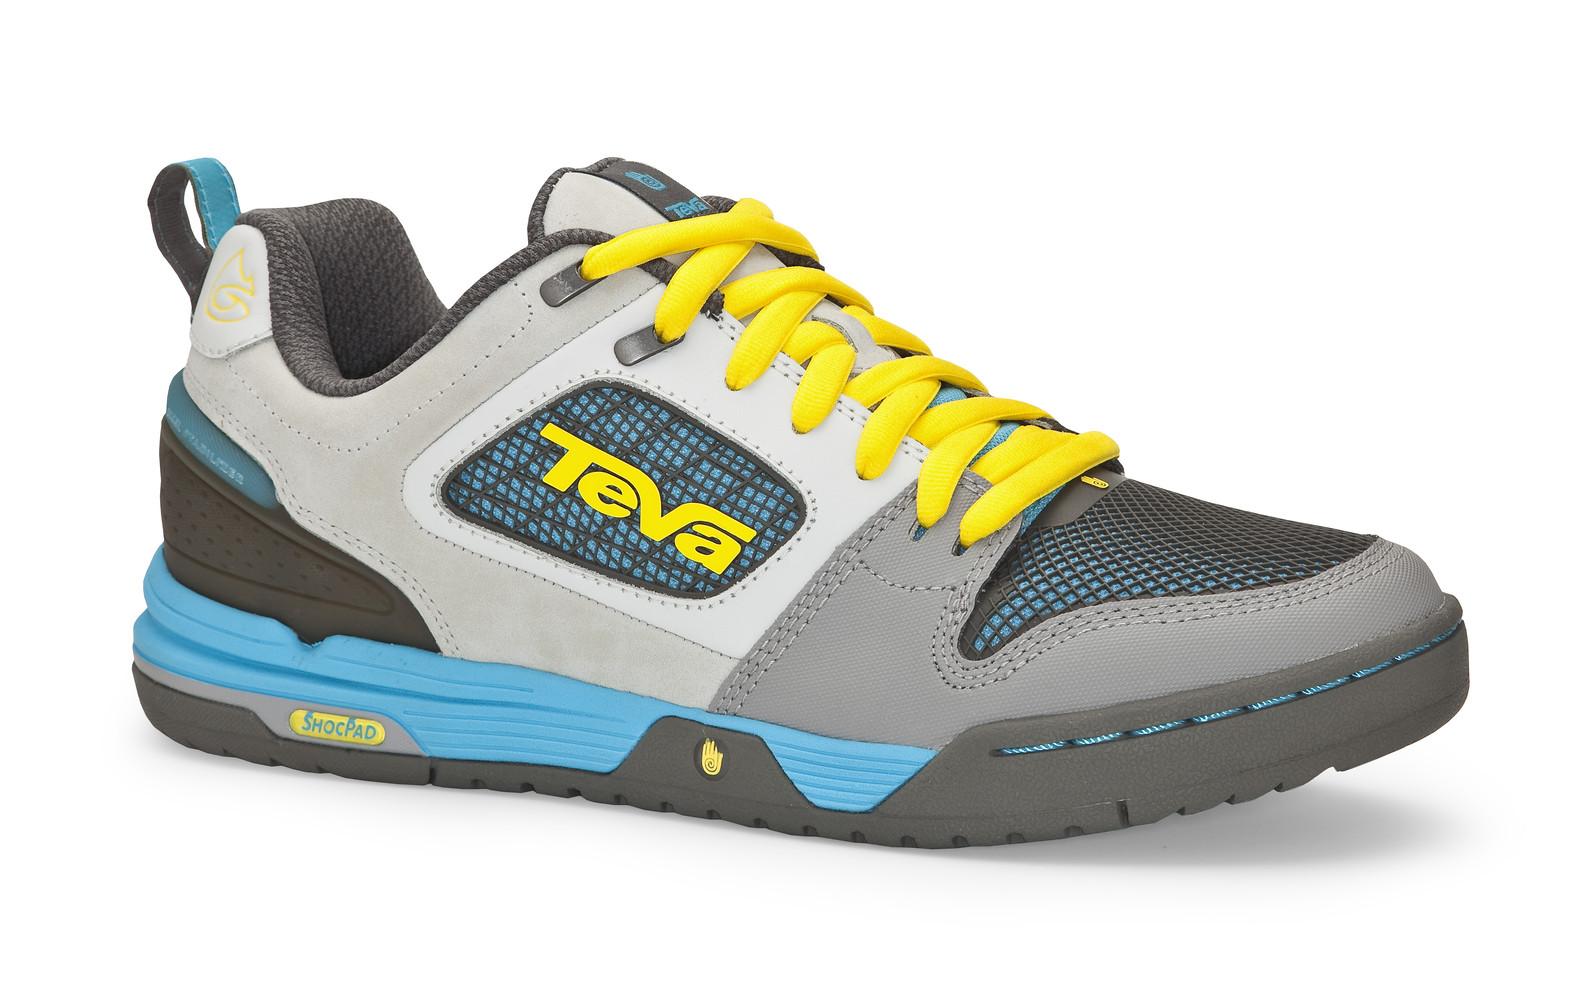 Teva Links Flat Pedal Shoe - Reviews